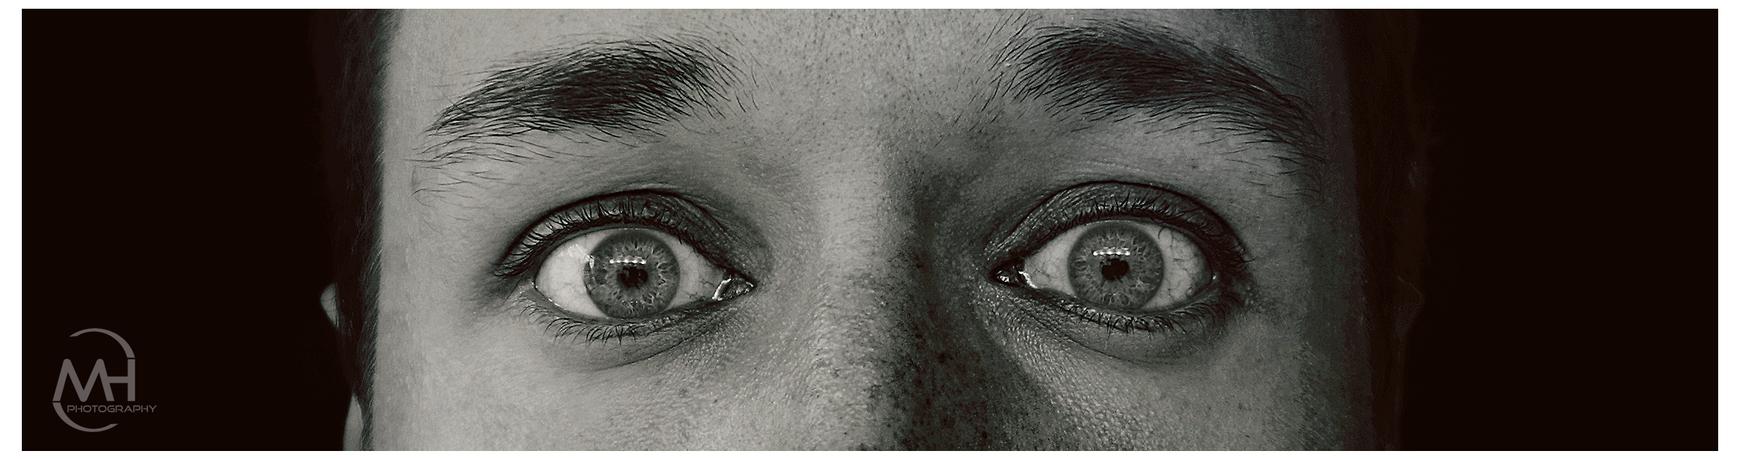 Monochrome eyes